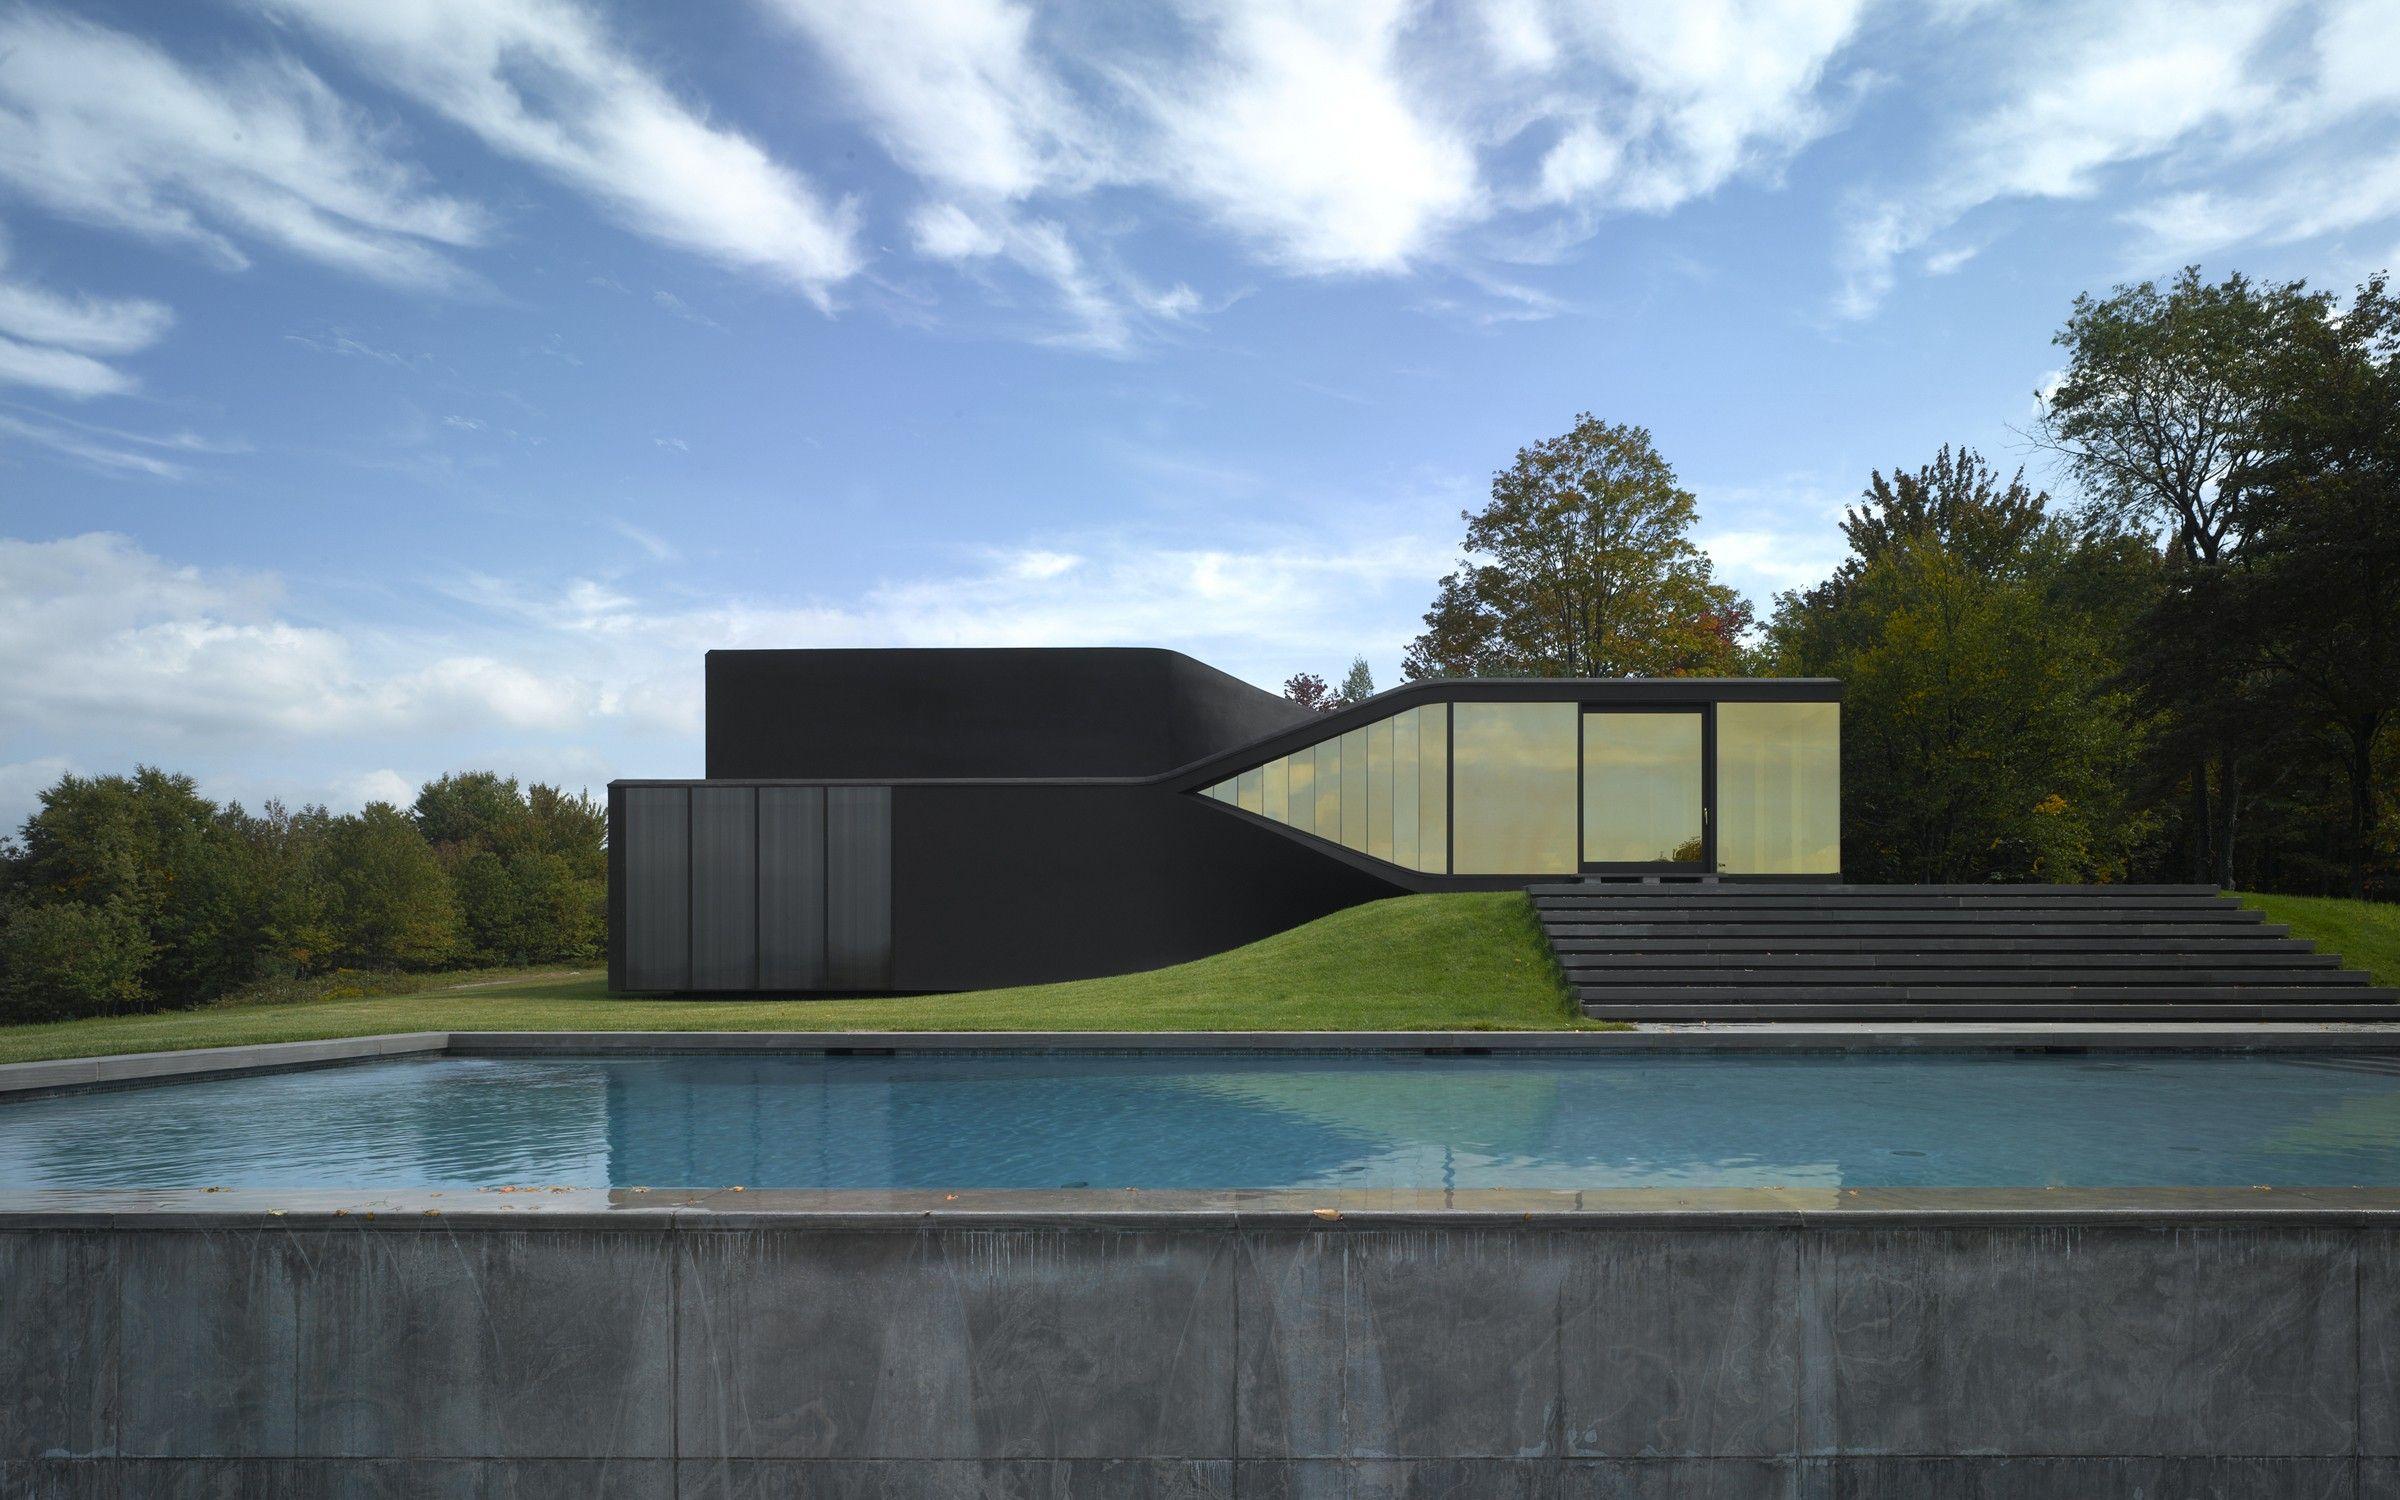 Villa nm un studio van berkel